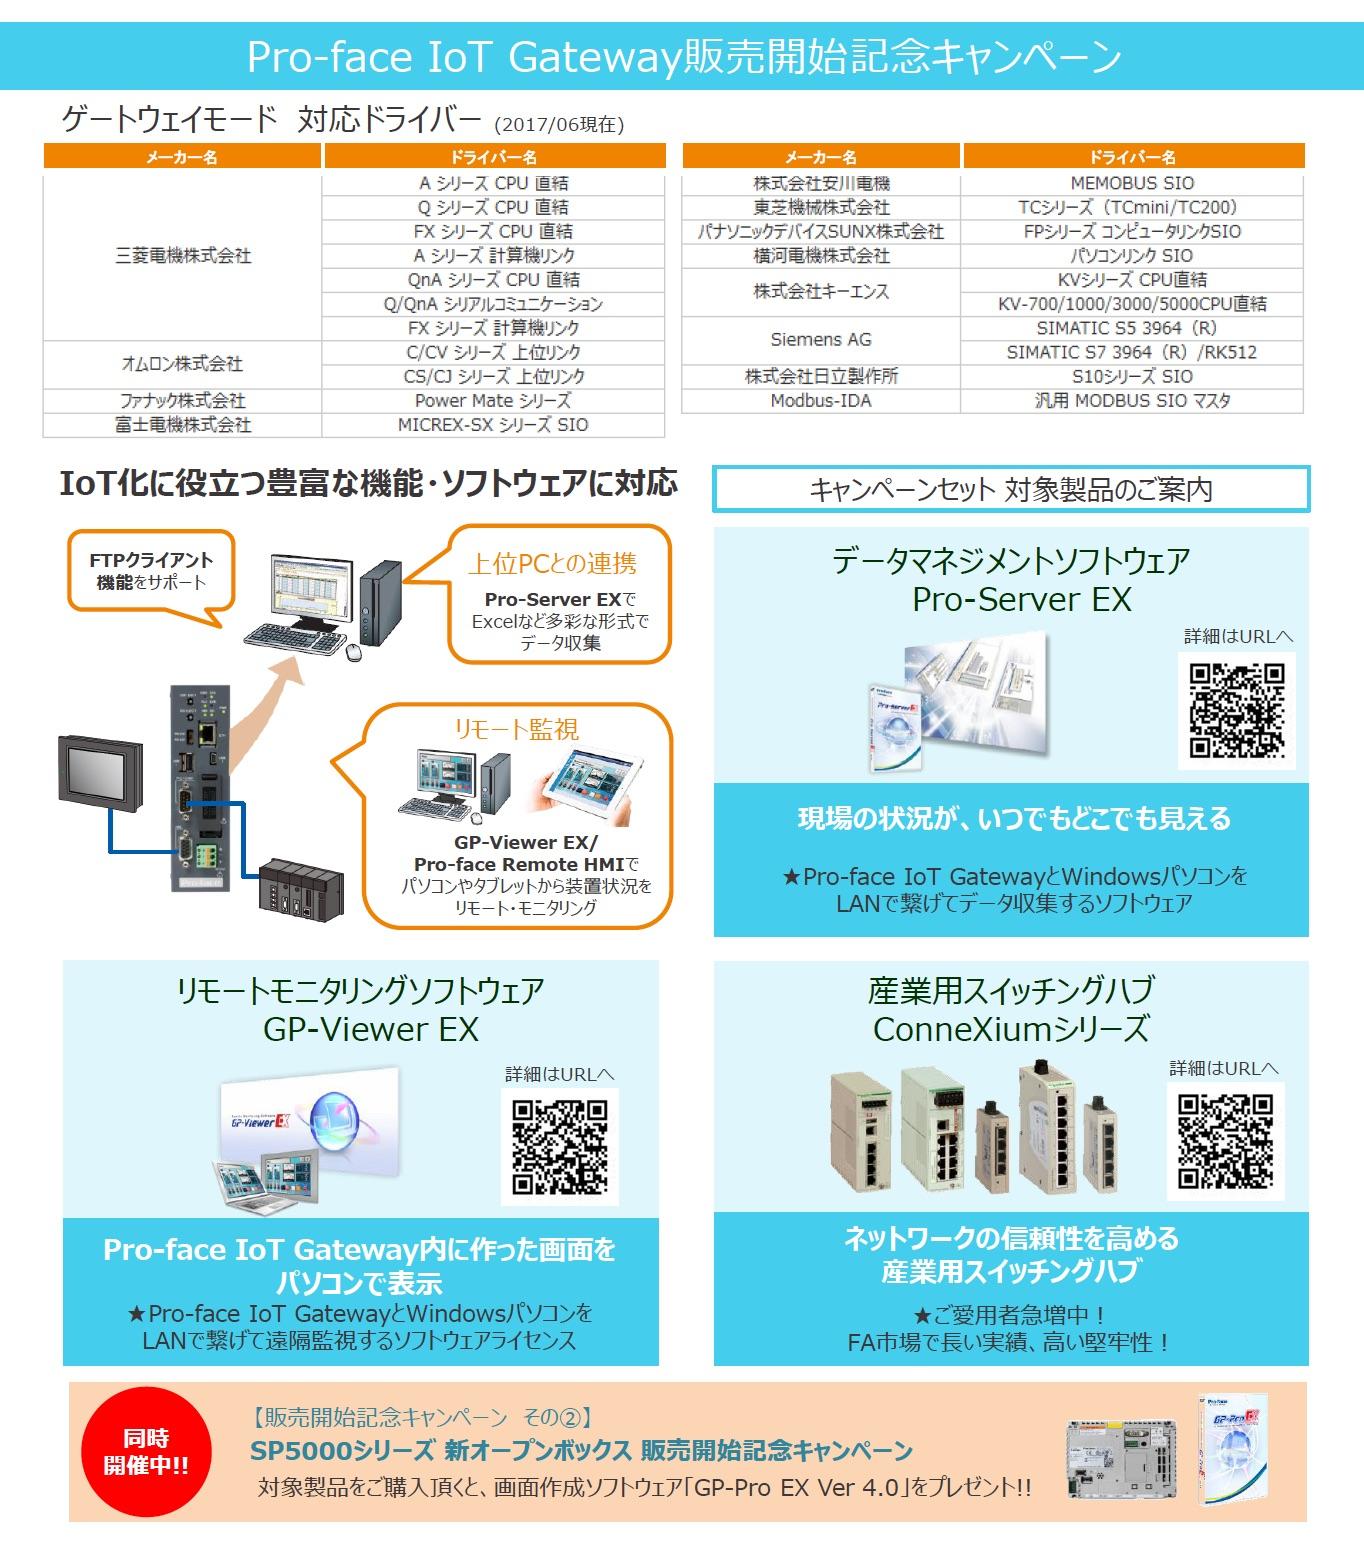 IoT Gatewayキャンペーン詳細2